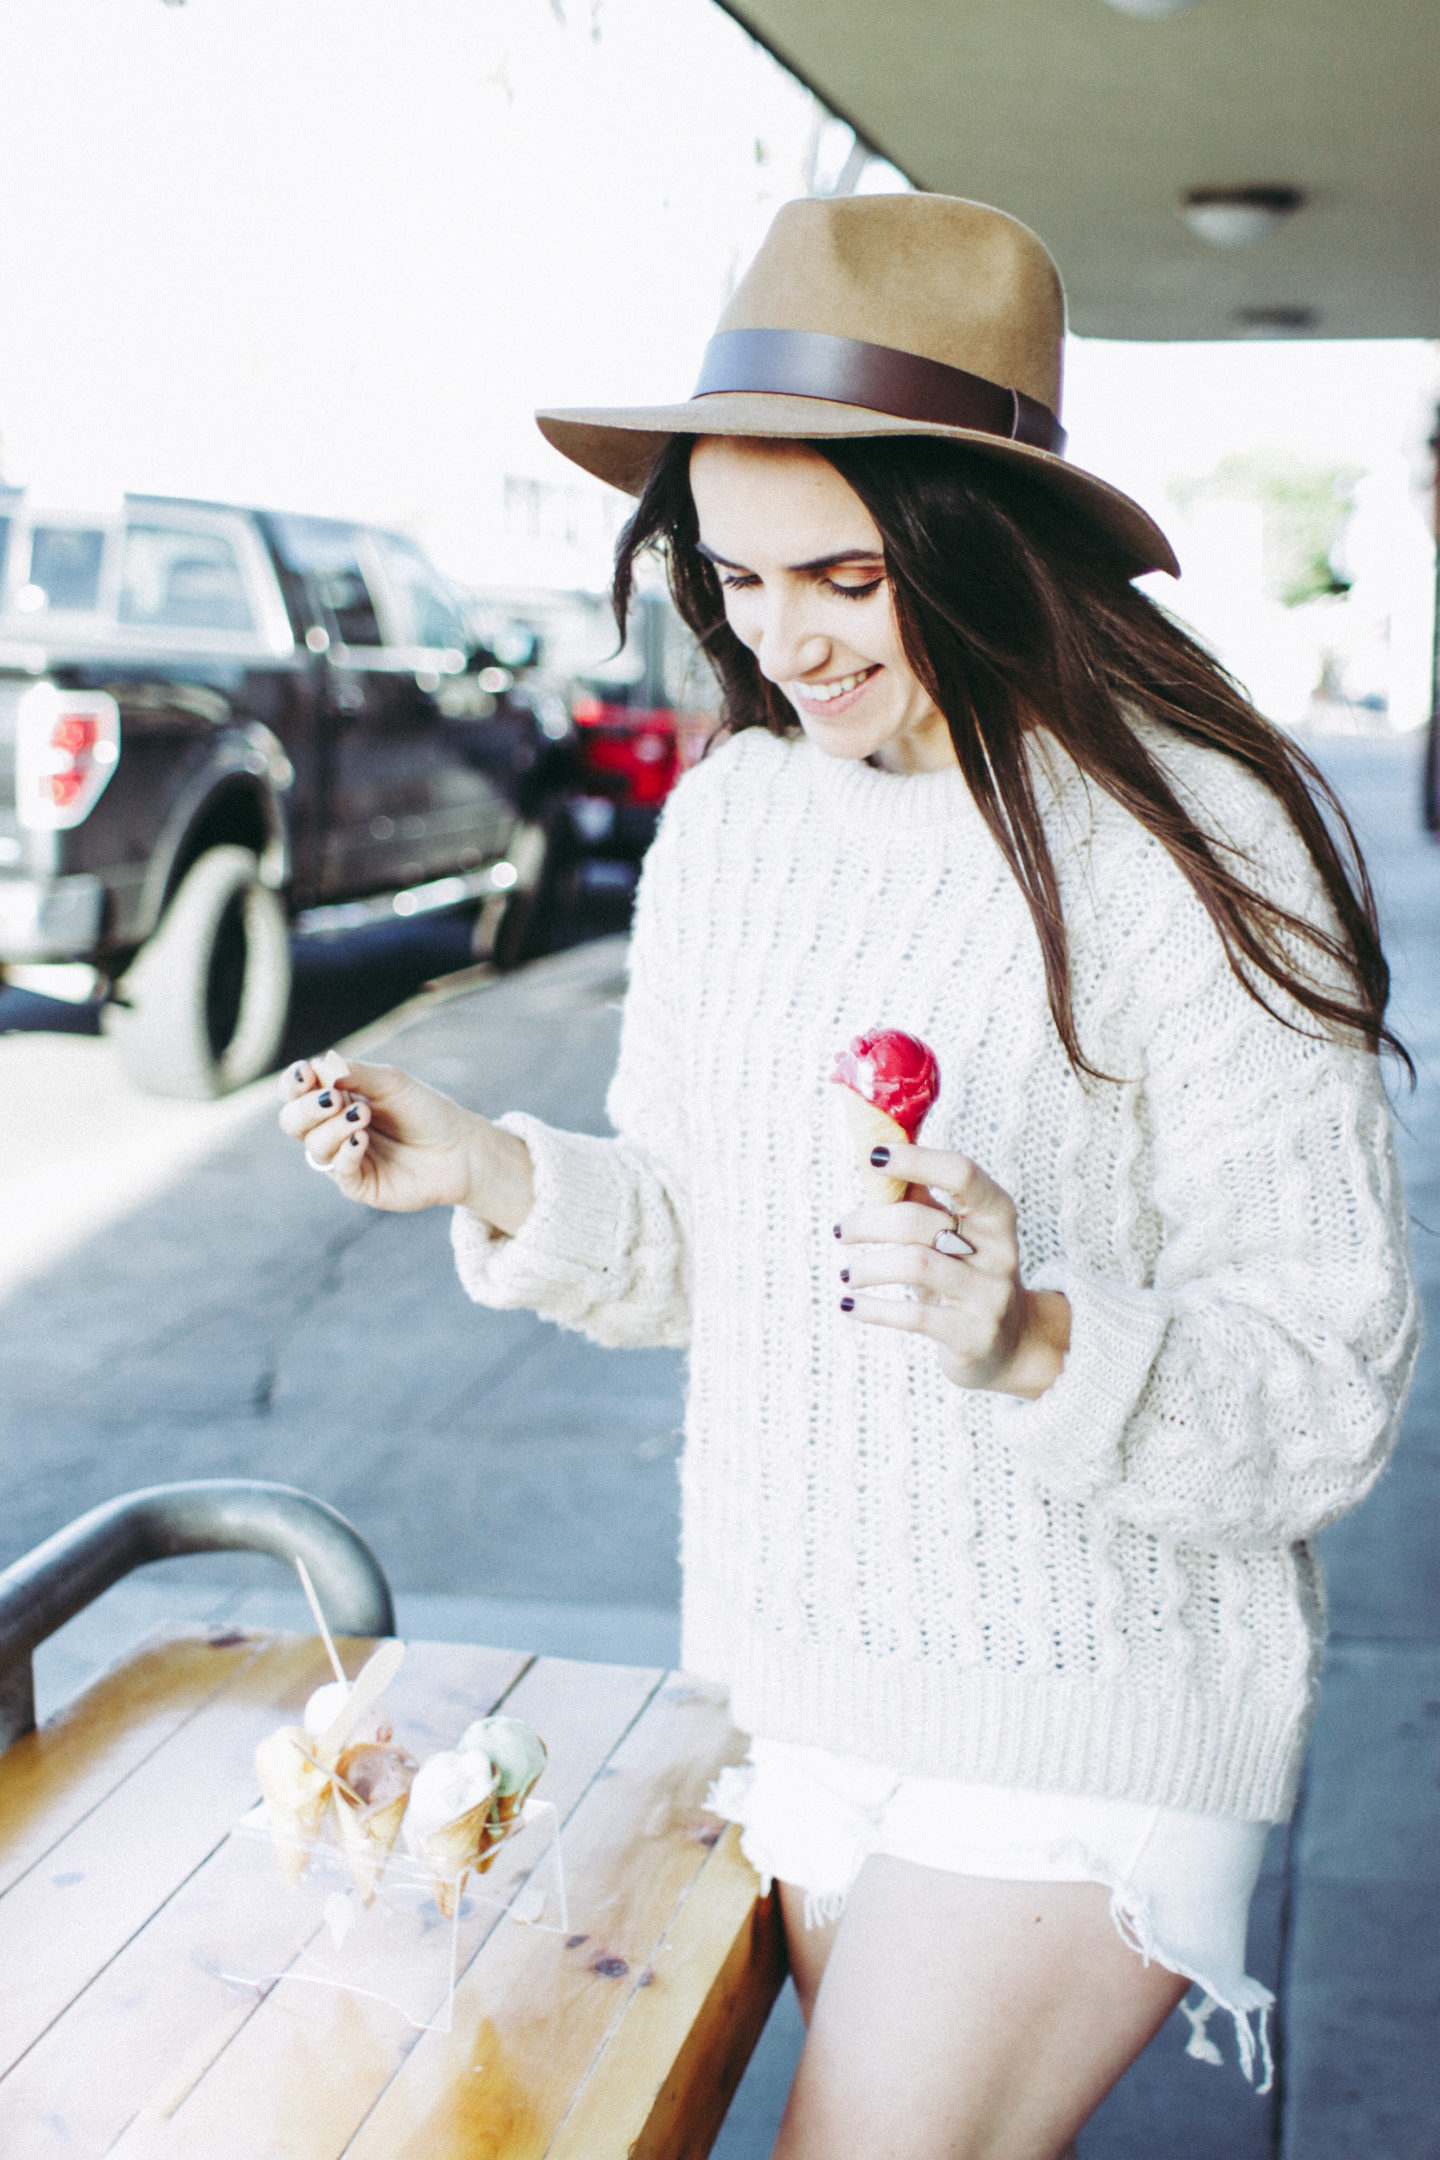 North Park Hammonds Gourmet Icecream, San Diego – Ana Free